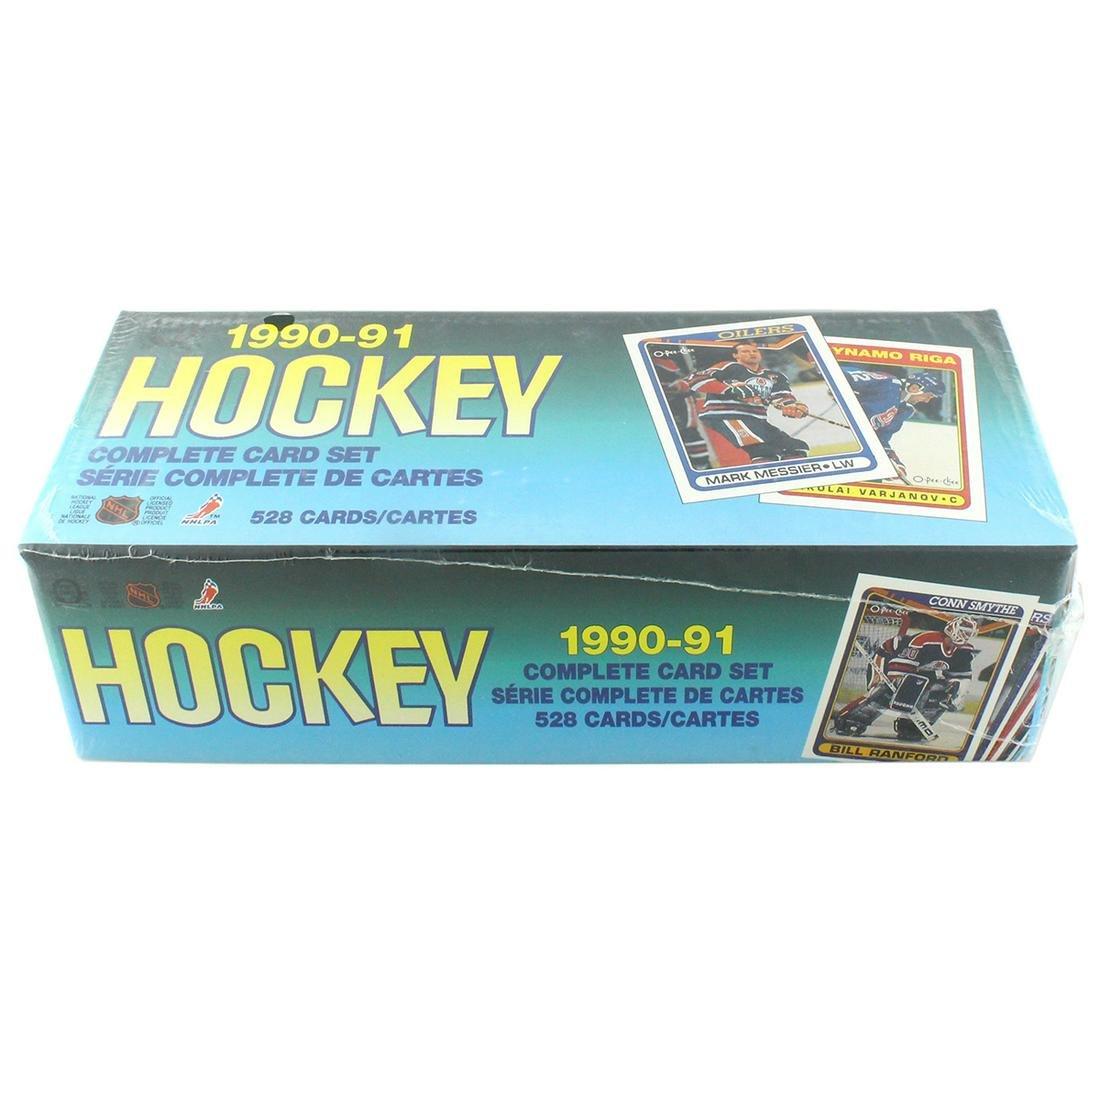 Rare 1990-91 Un-Opened Box Complete Card Set Hockey